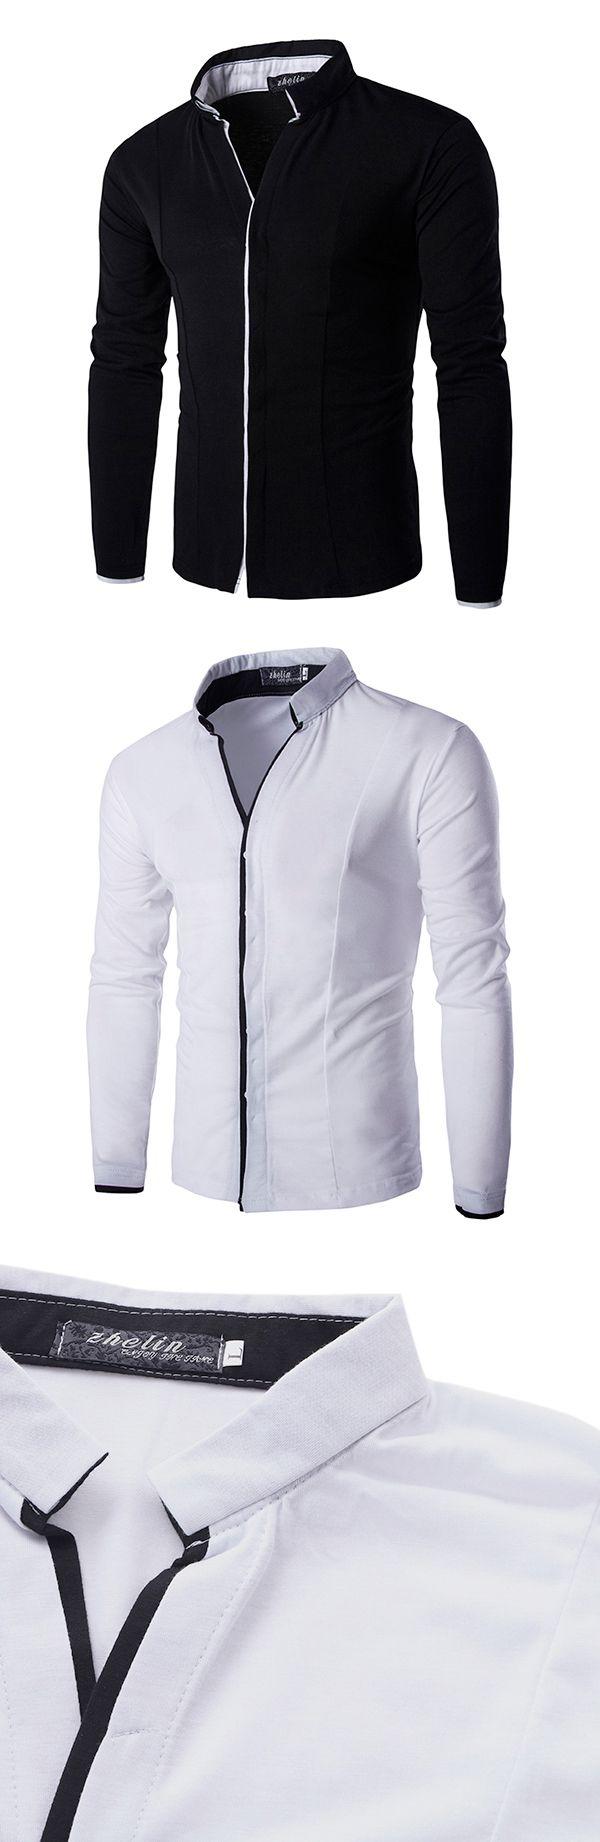 US$18.88 (46% OFF) Casual Business Stand Collar Long Sleeve Slim V Neck Designer Shirts for Men